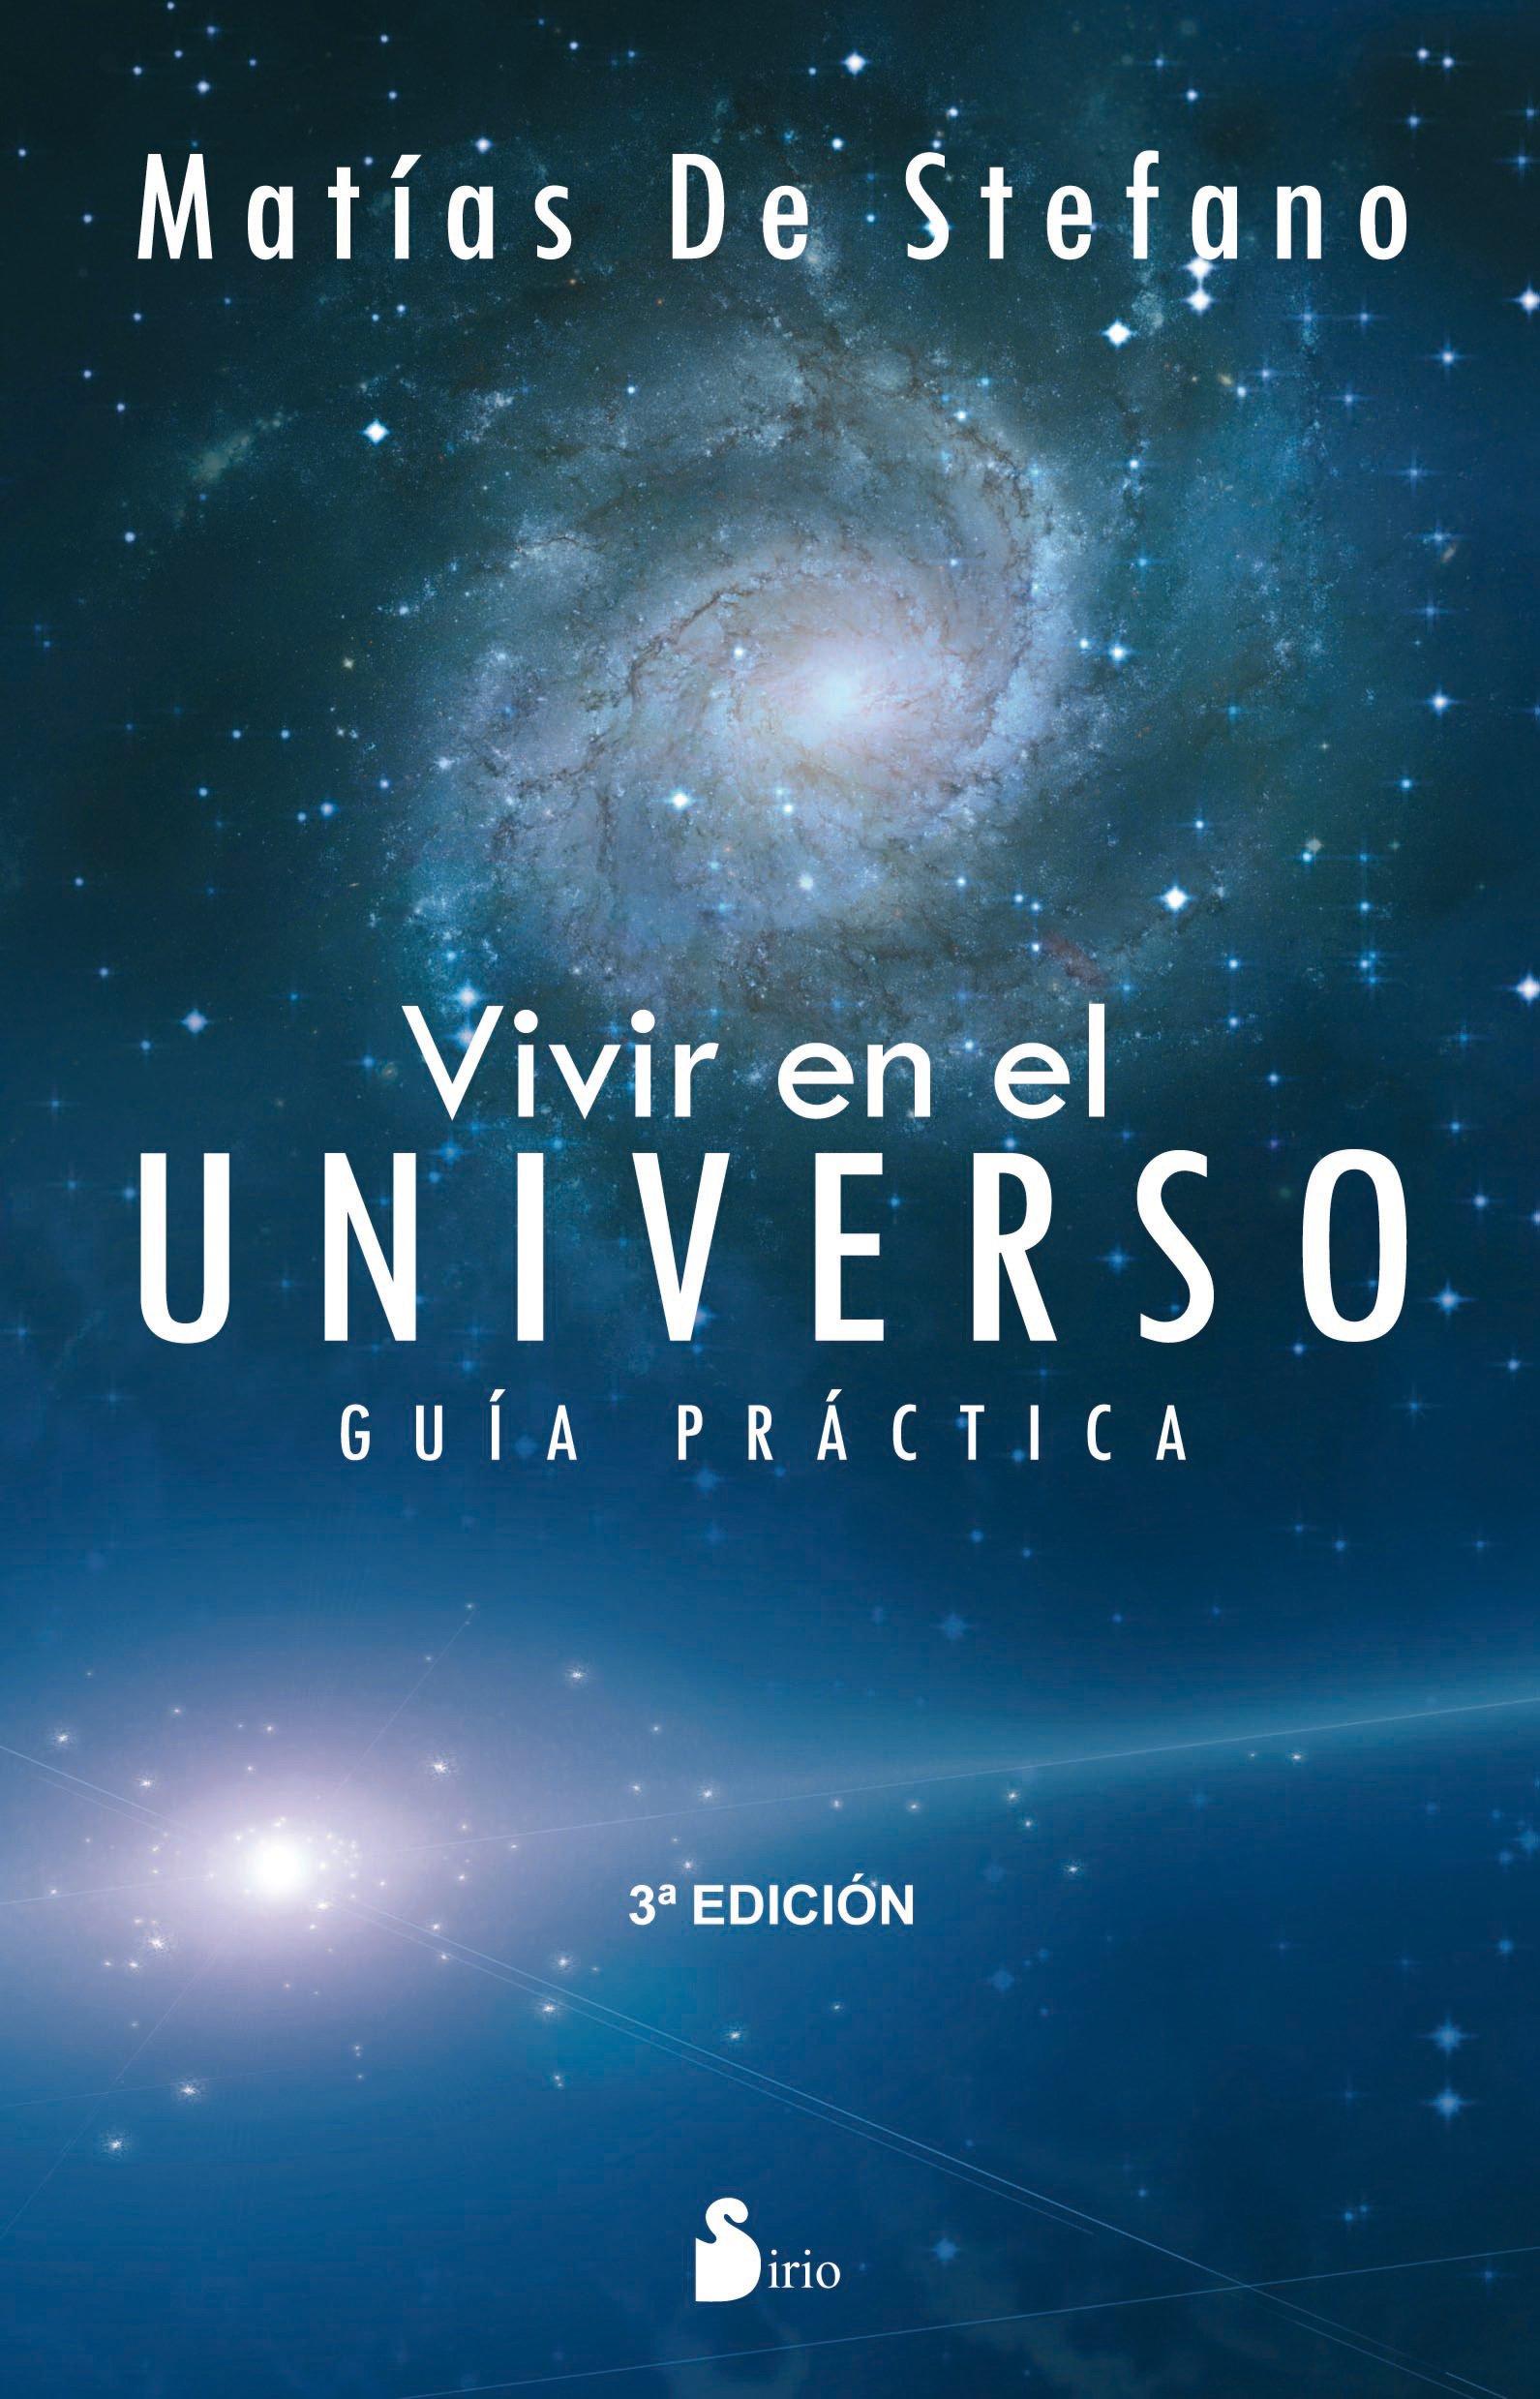 Vivir en el Universo: Guia Practica (Spanish) Paperback – Jul 30 2012